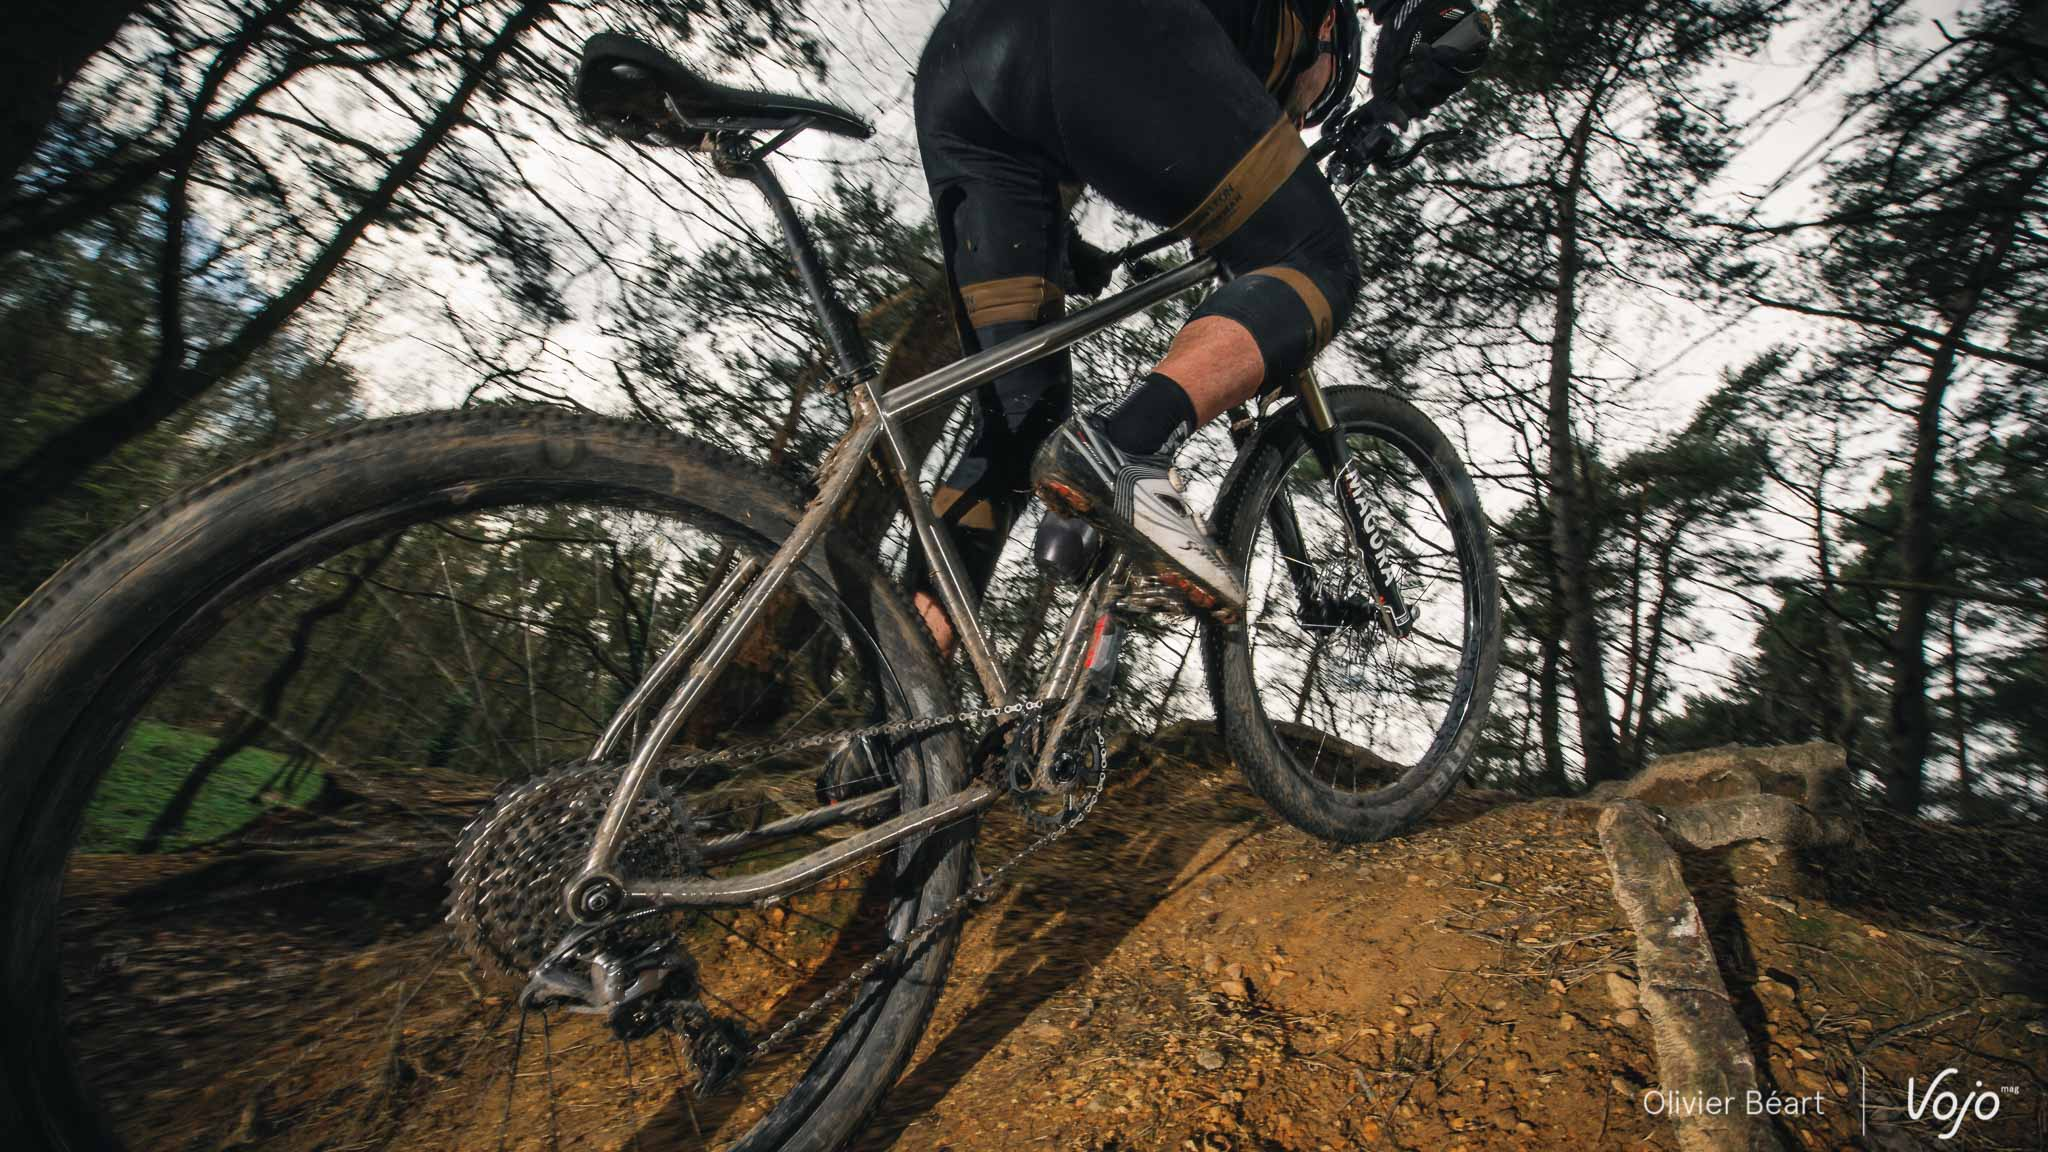 cycles_leon_decouverte_copyright_obeart_vojomag-73